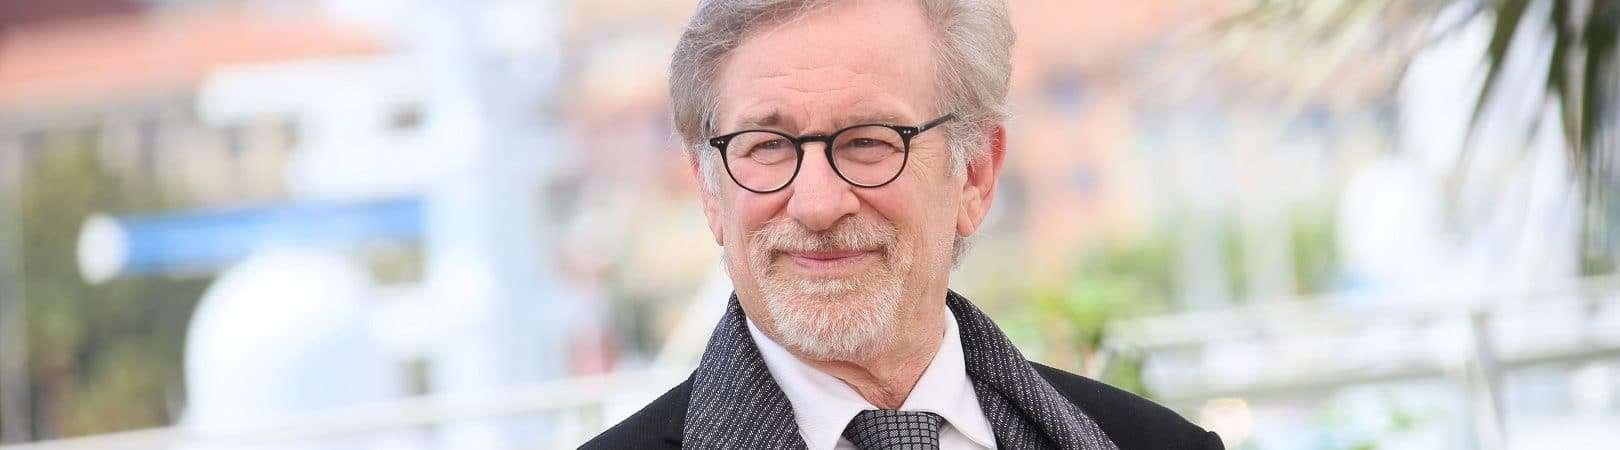 Steven Spielberg participa do 'The BFG (Le Bon Gros Geant - Le BGG) durante o 69º Festival de Cinema de Cannes. Imagem: Denis Makarenko/Shutterstock